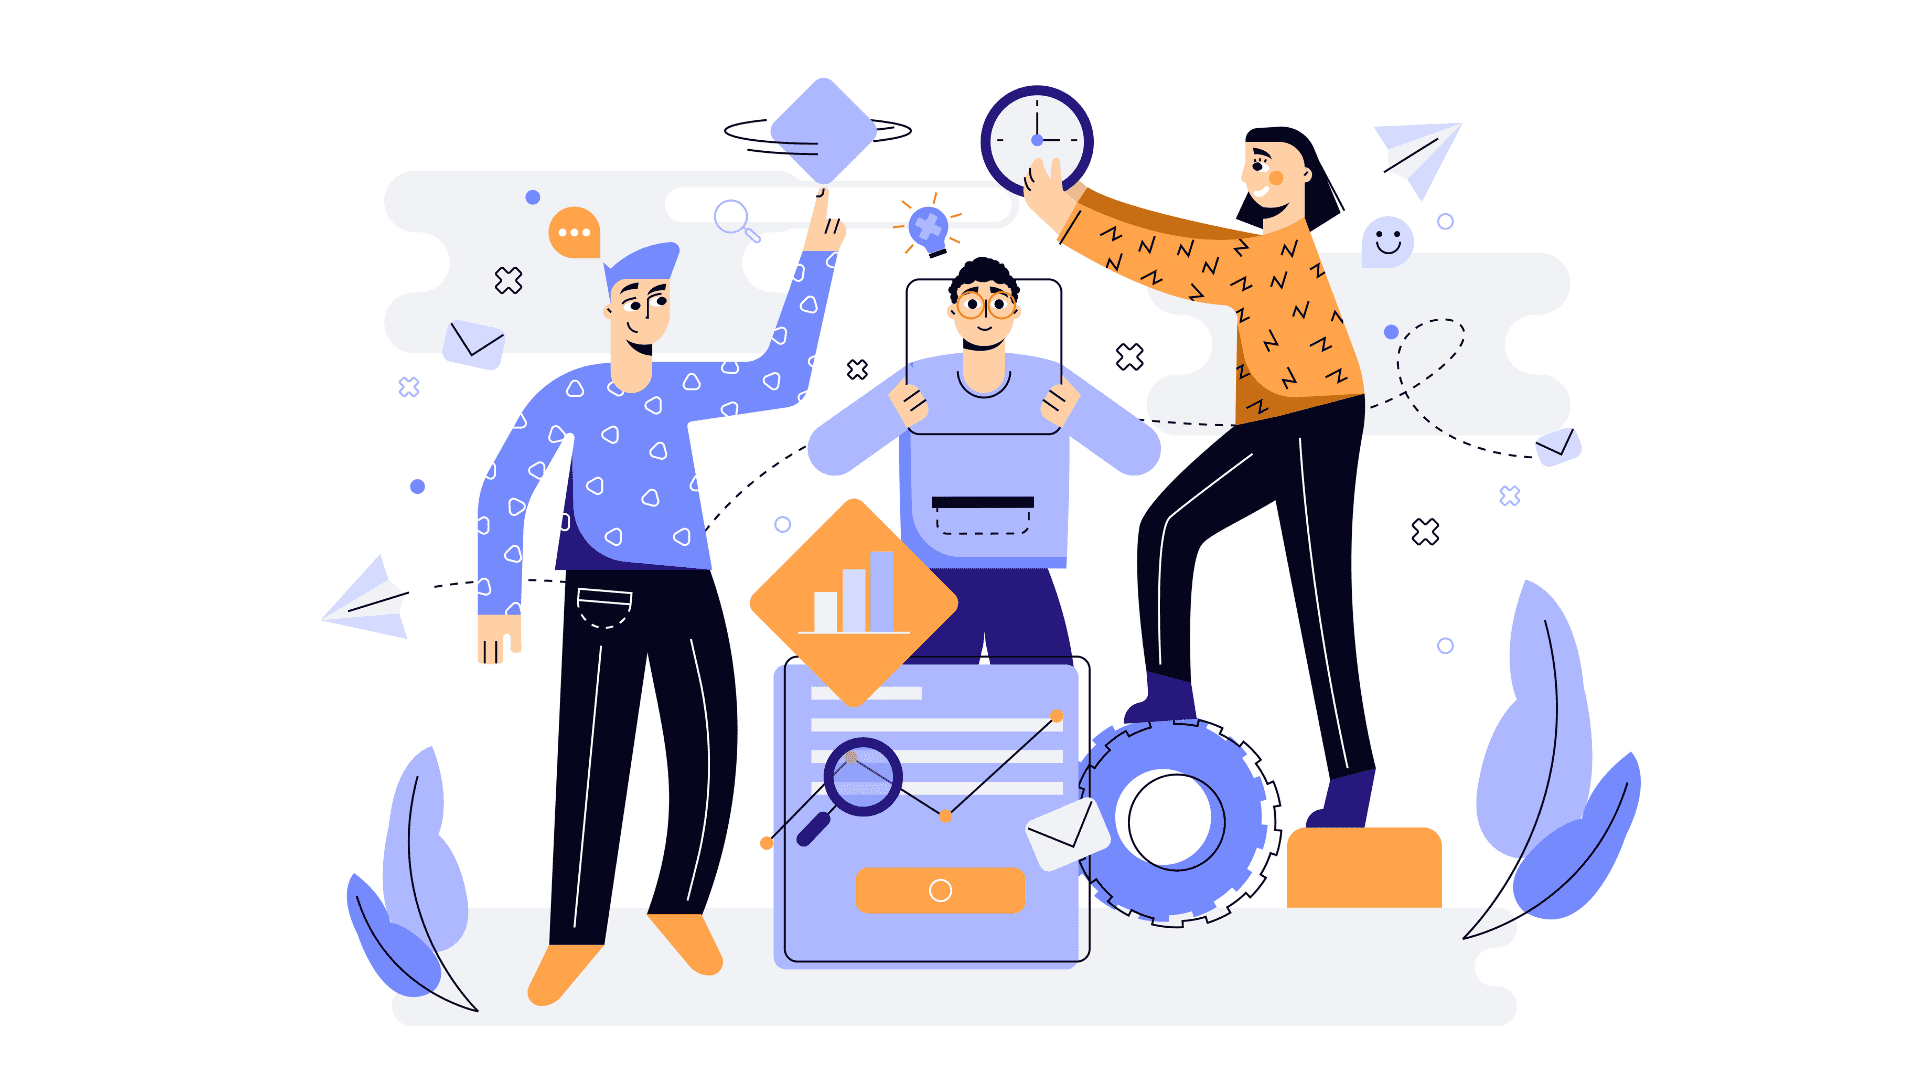 improve mobile app development with team collaboration